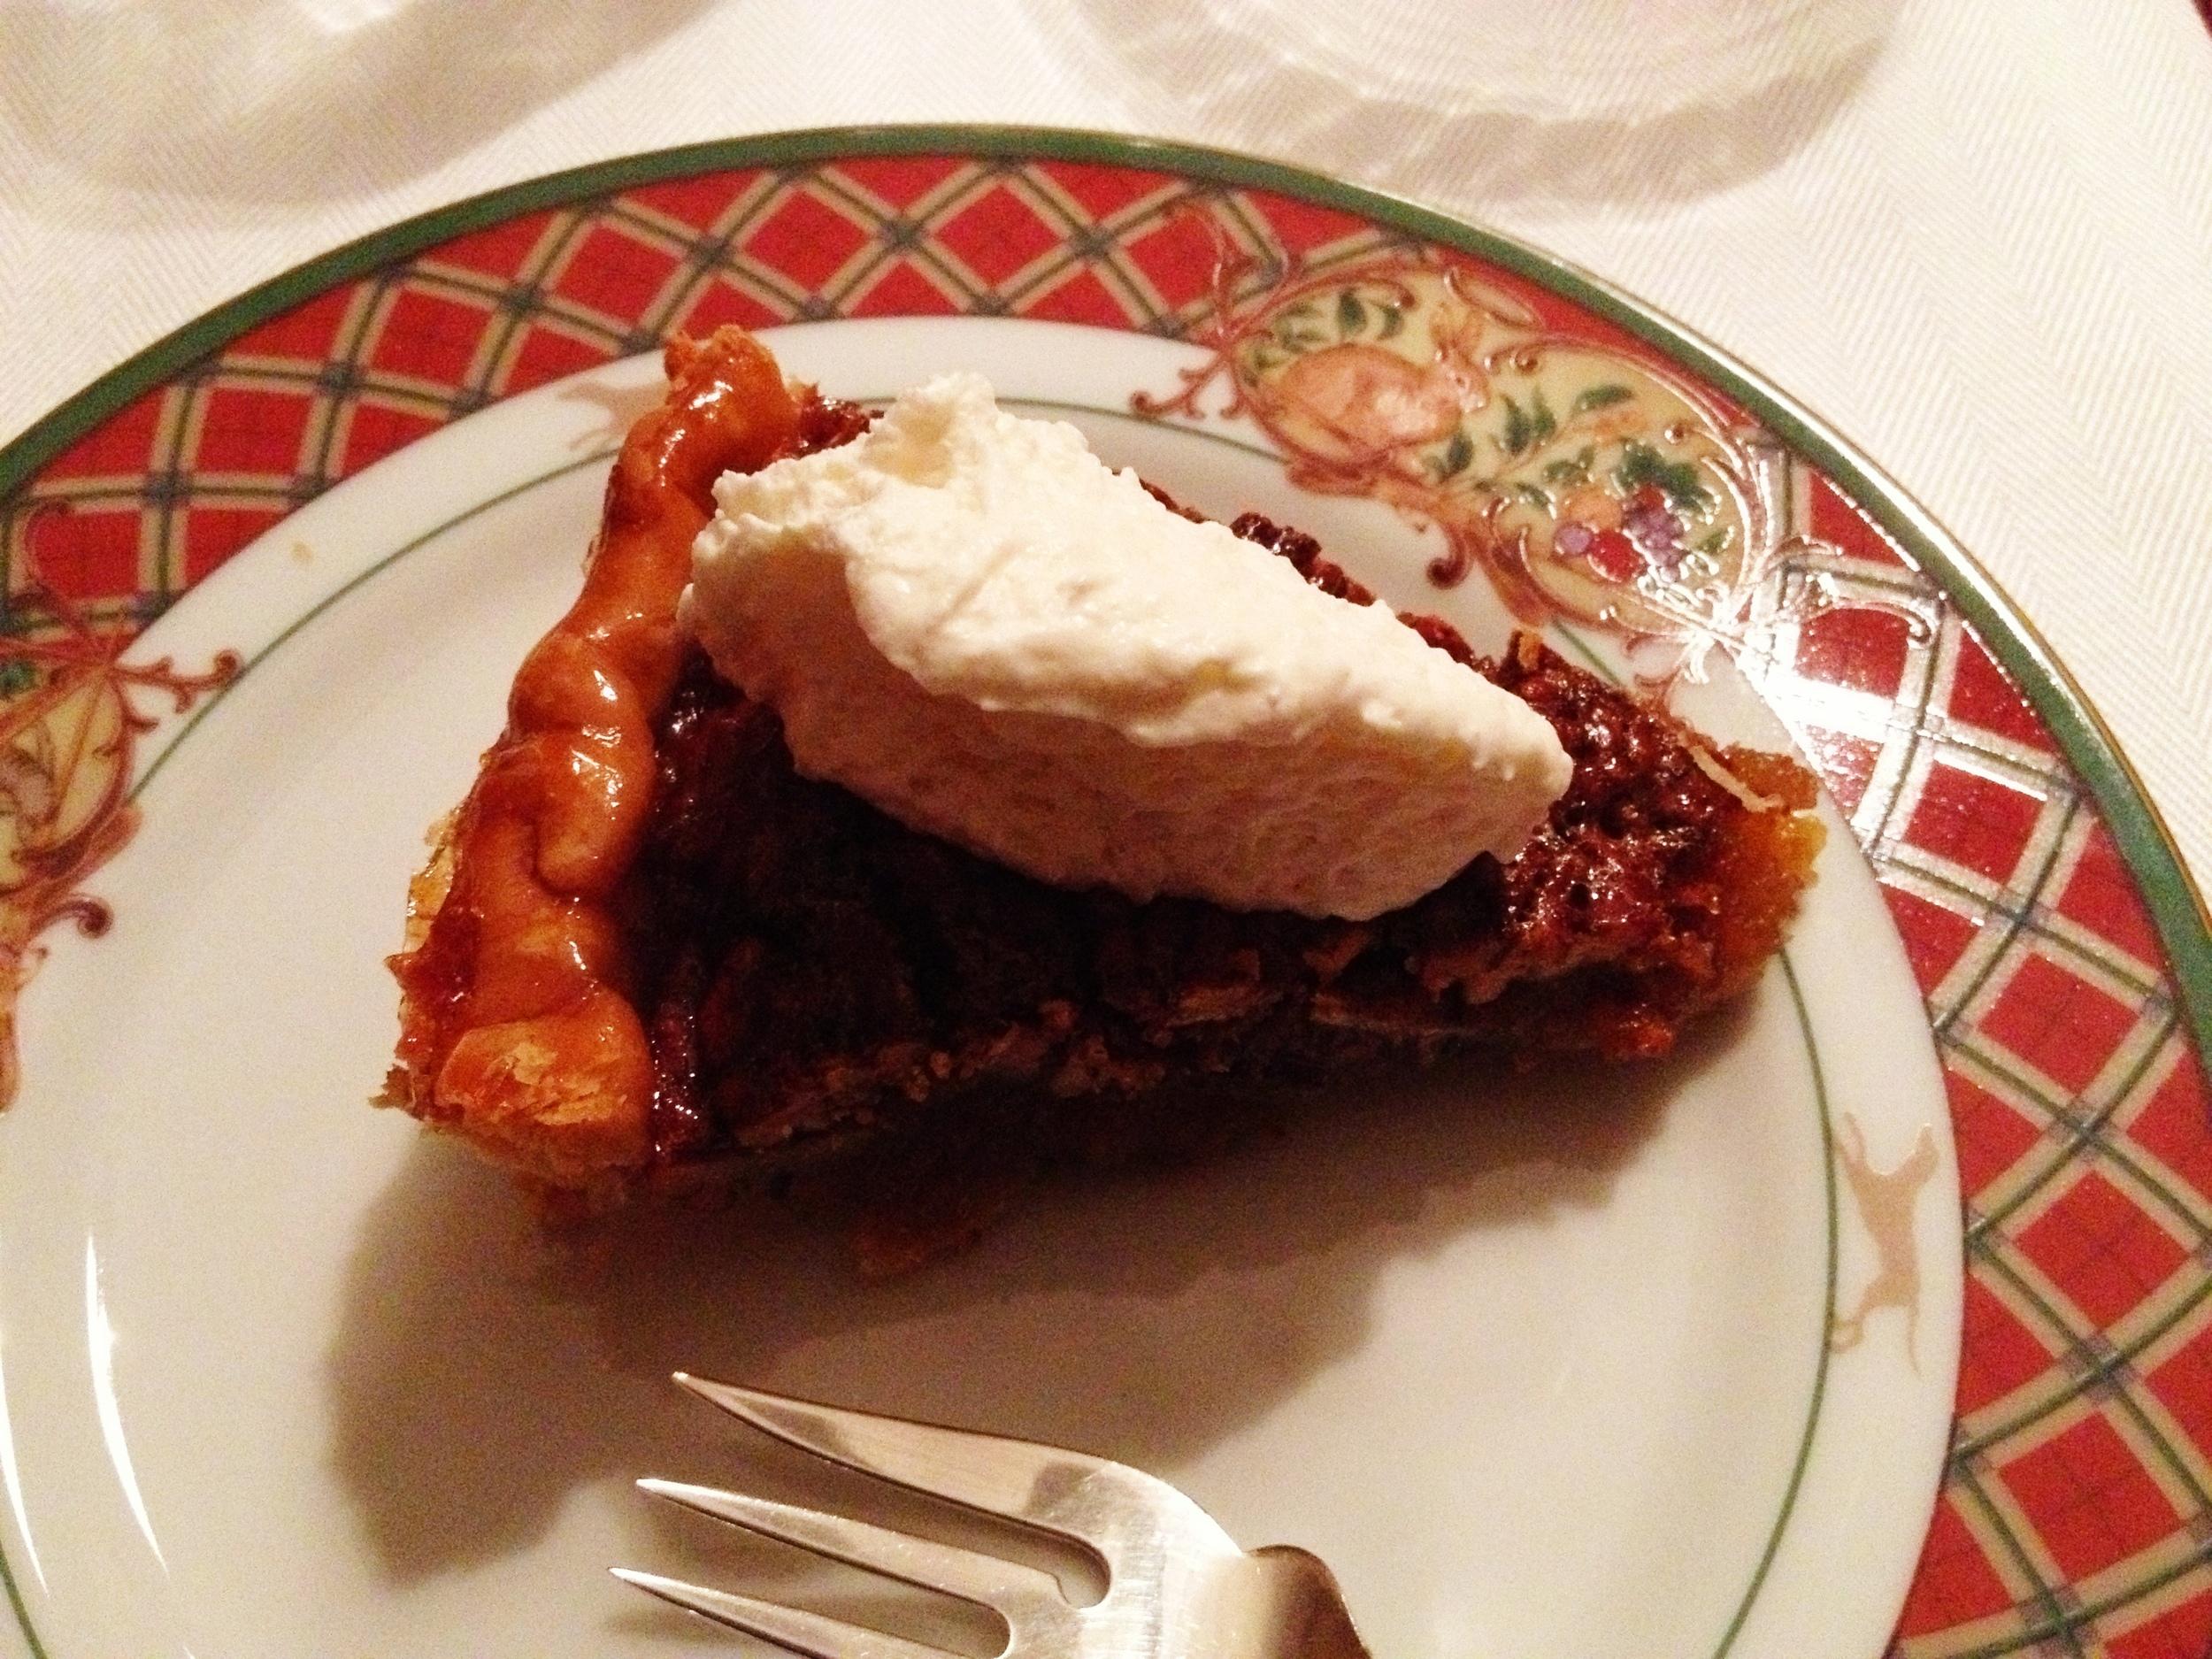 Homemade pecan pie with homemade whipped cream